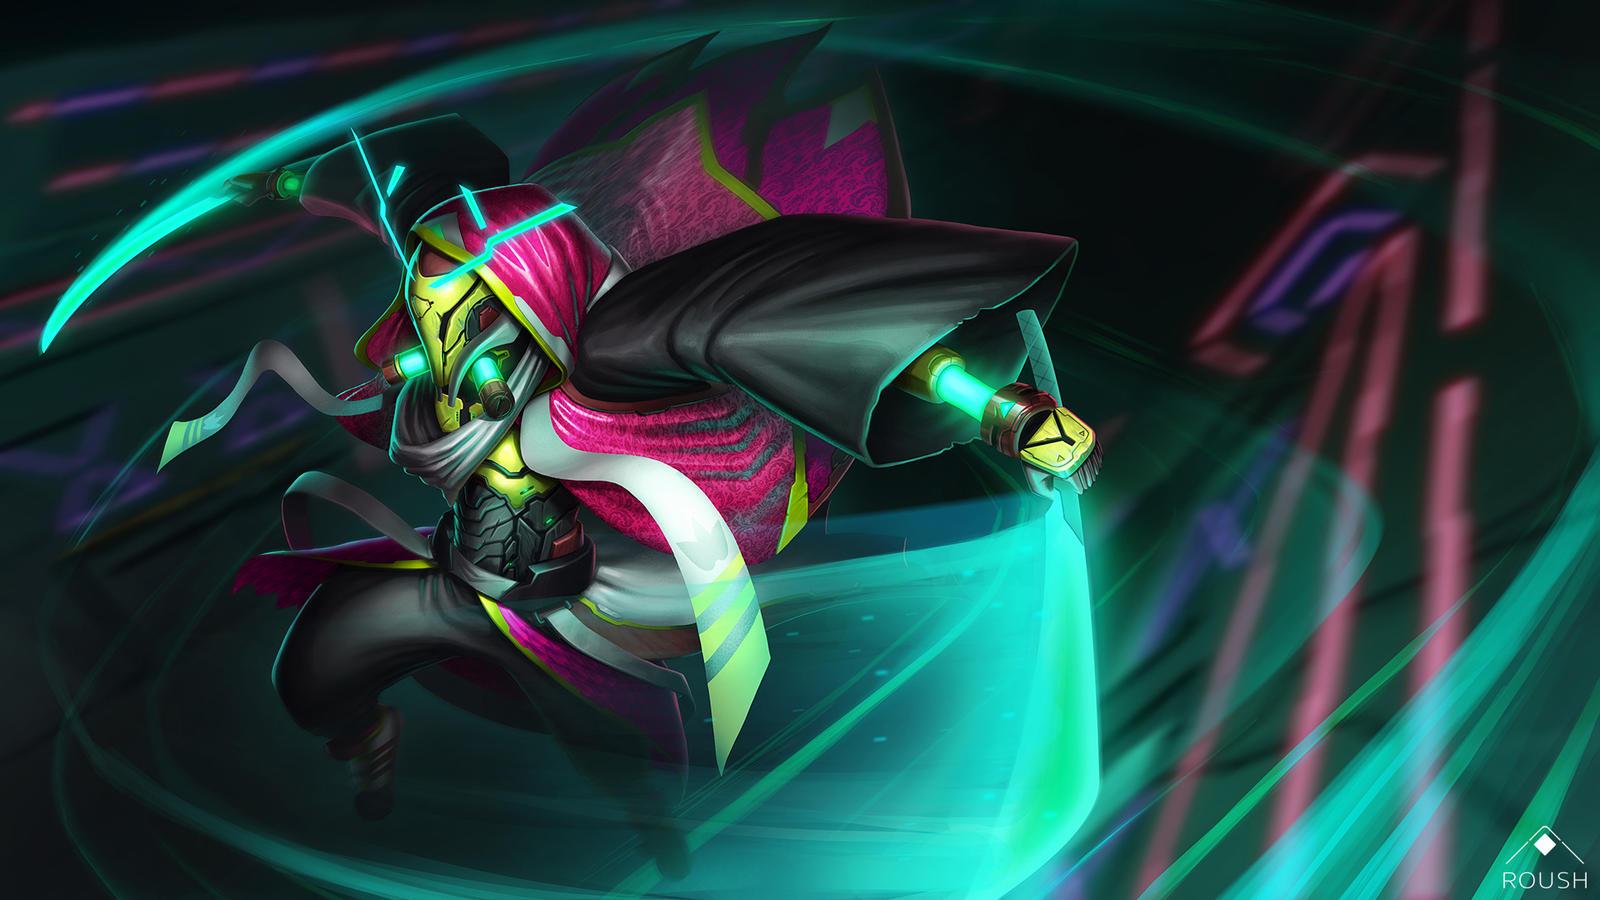 Cyberpunk Samurai by AdamRoush